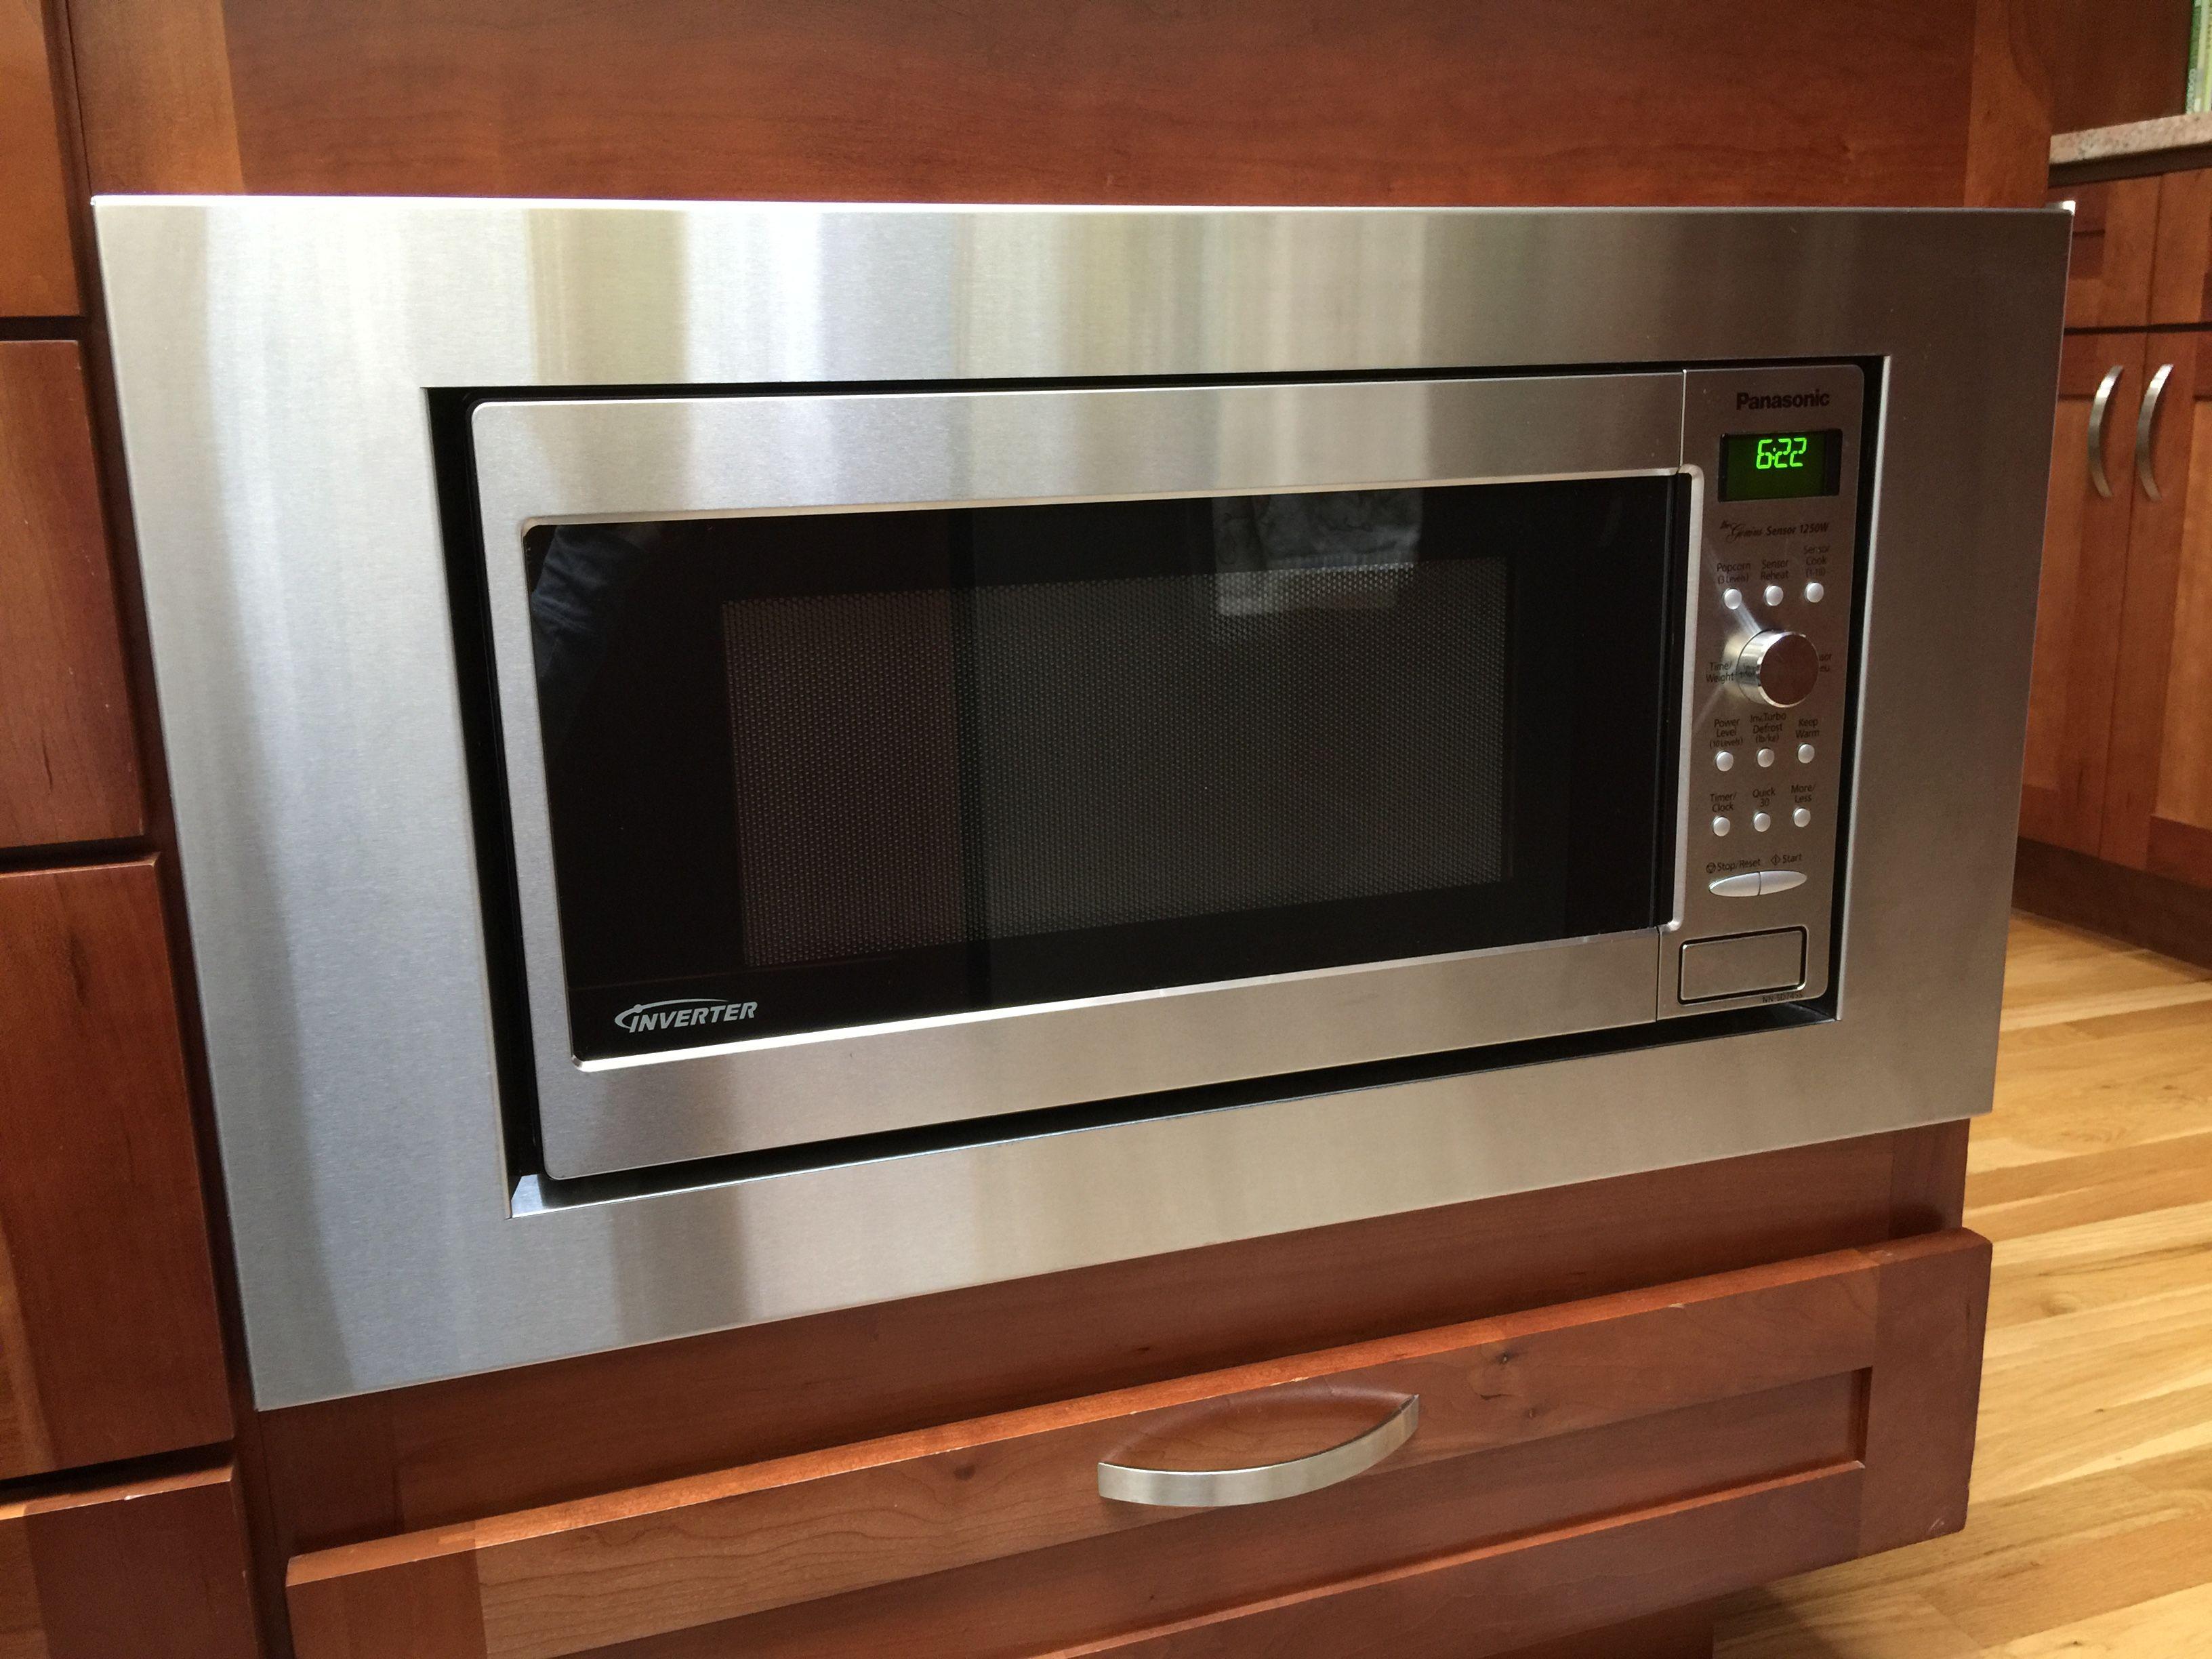 Panasonic Microwave Trim Kits Canada  BestMicrowave